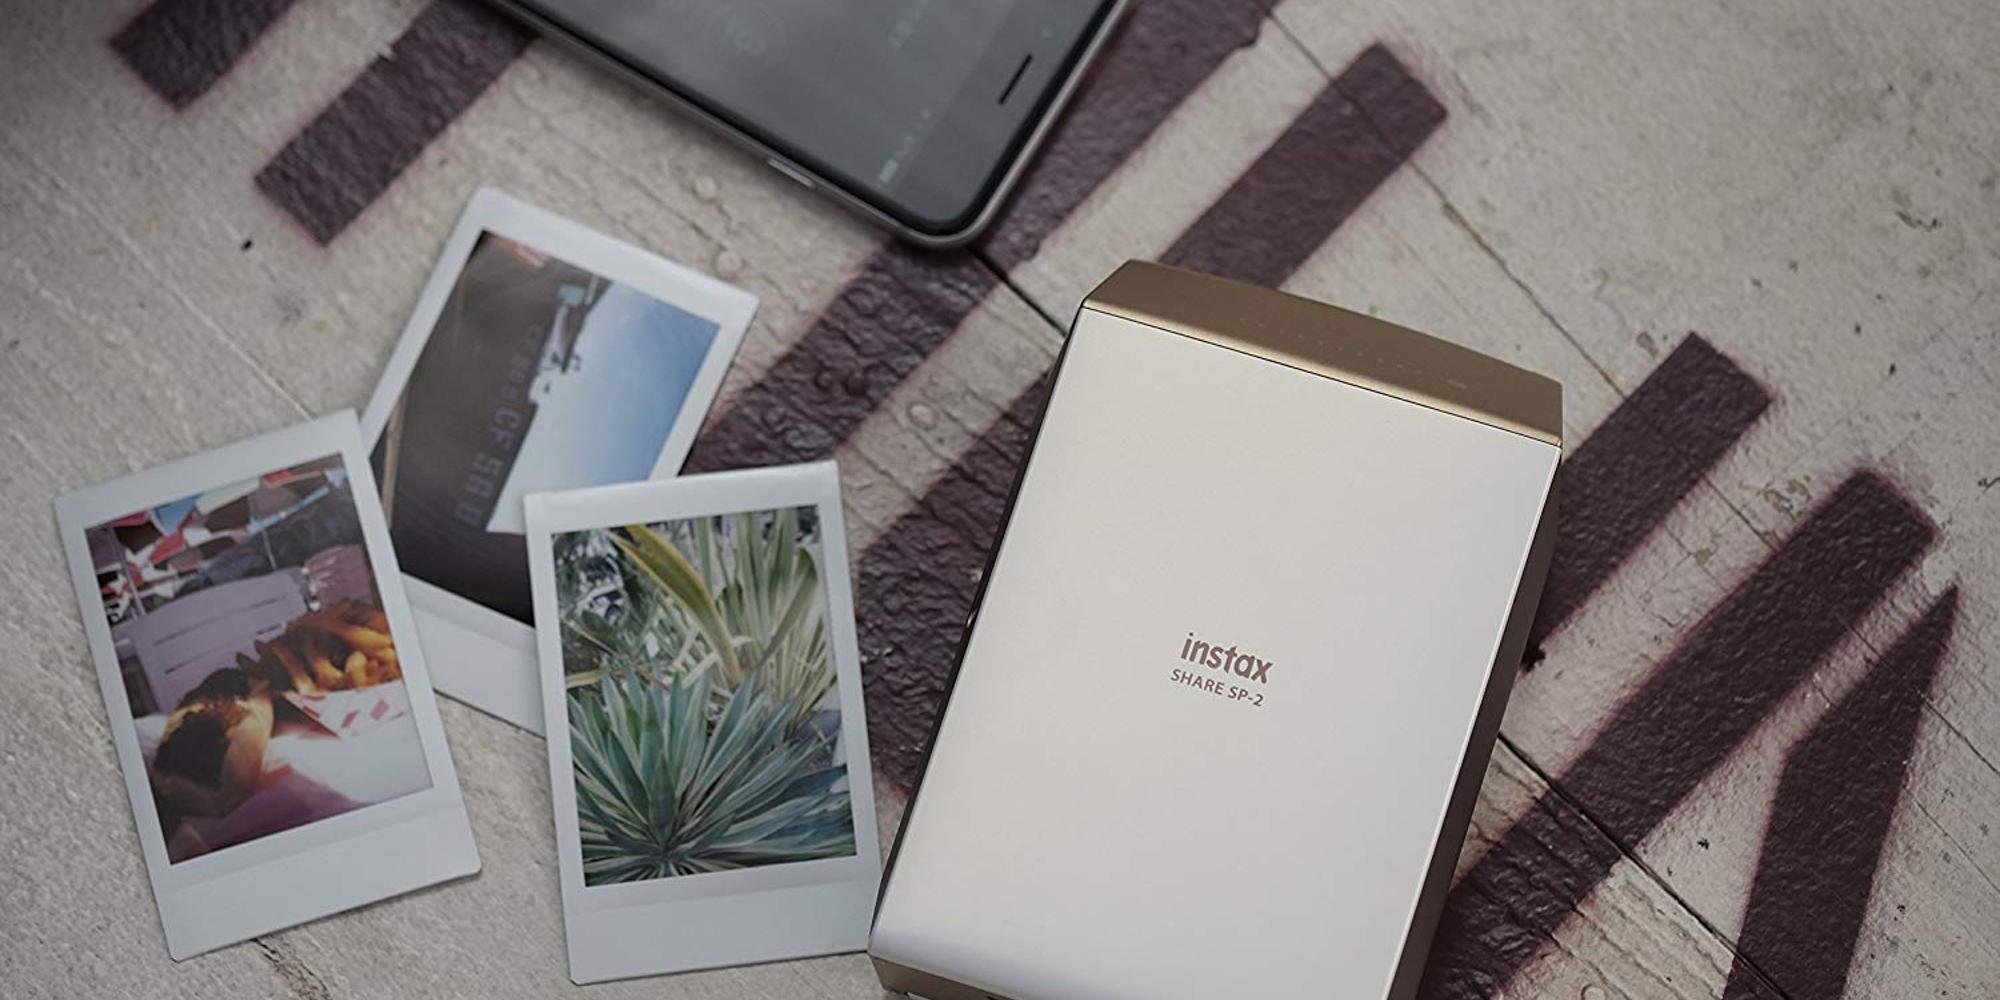 Bundle Fujifilm's $80 Share SP-2 Smartphone Printer w/ 2 packs of film and save $40